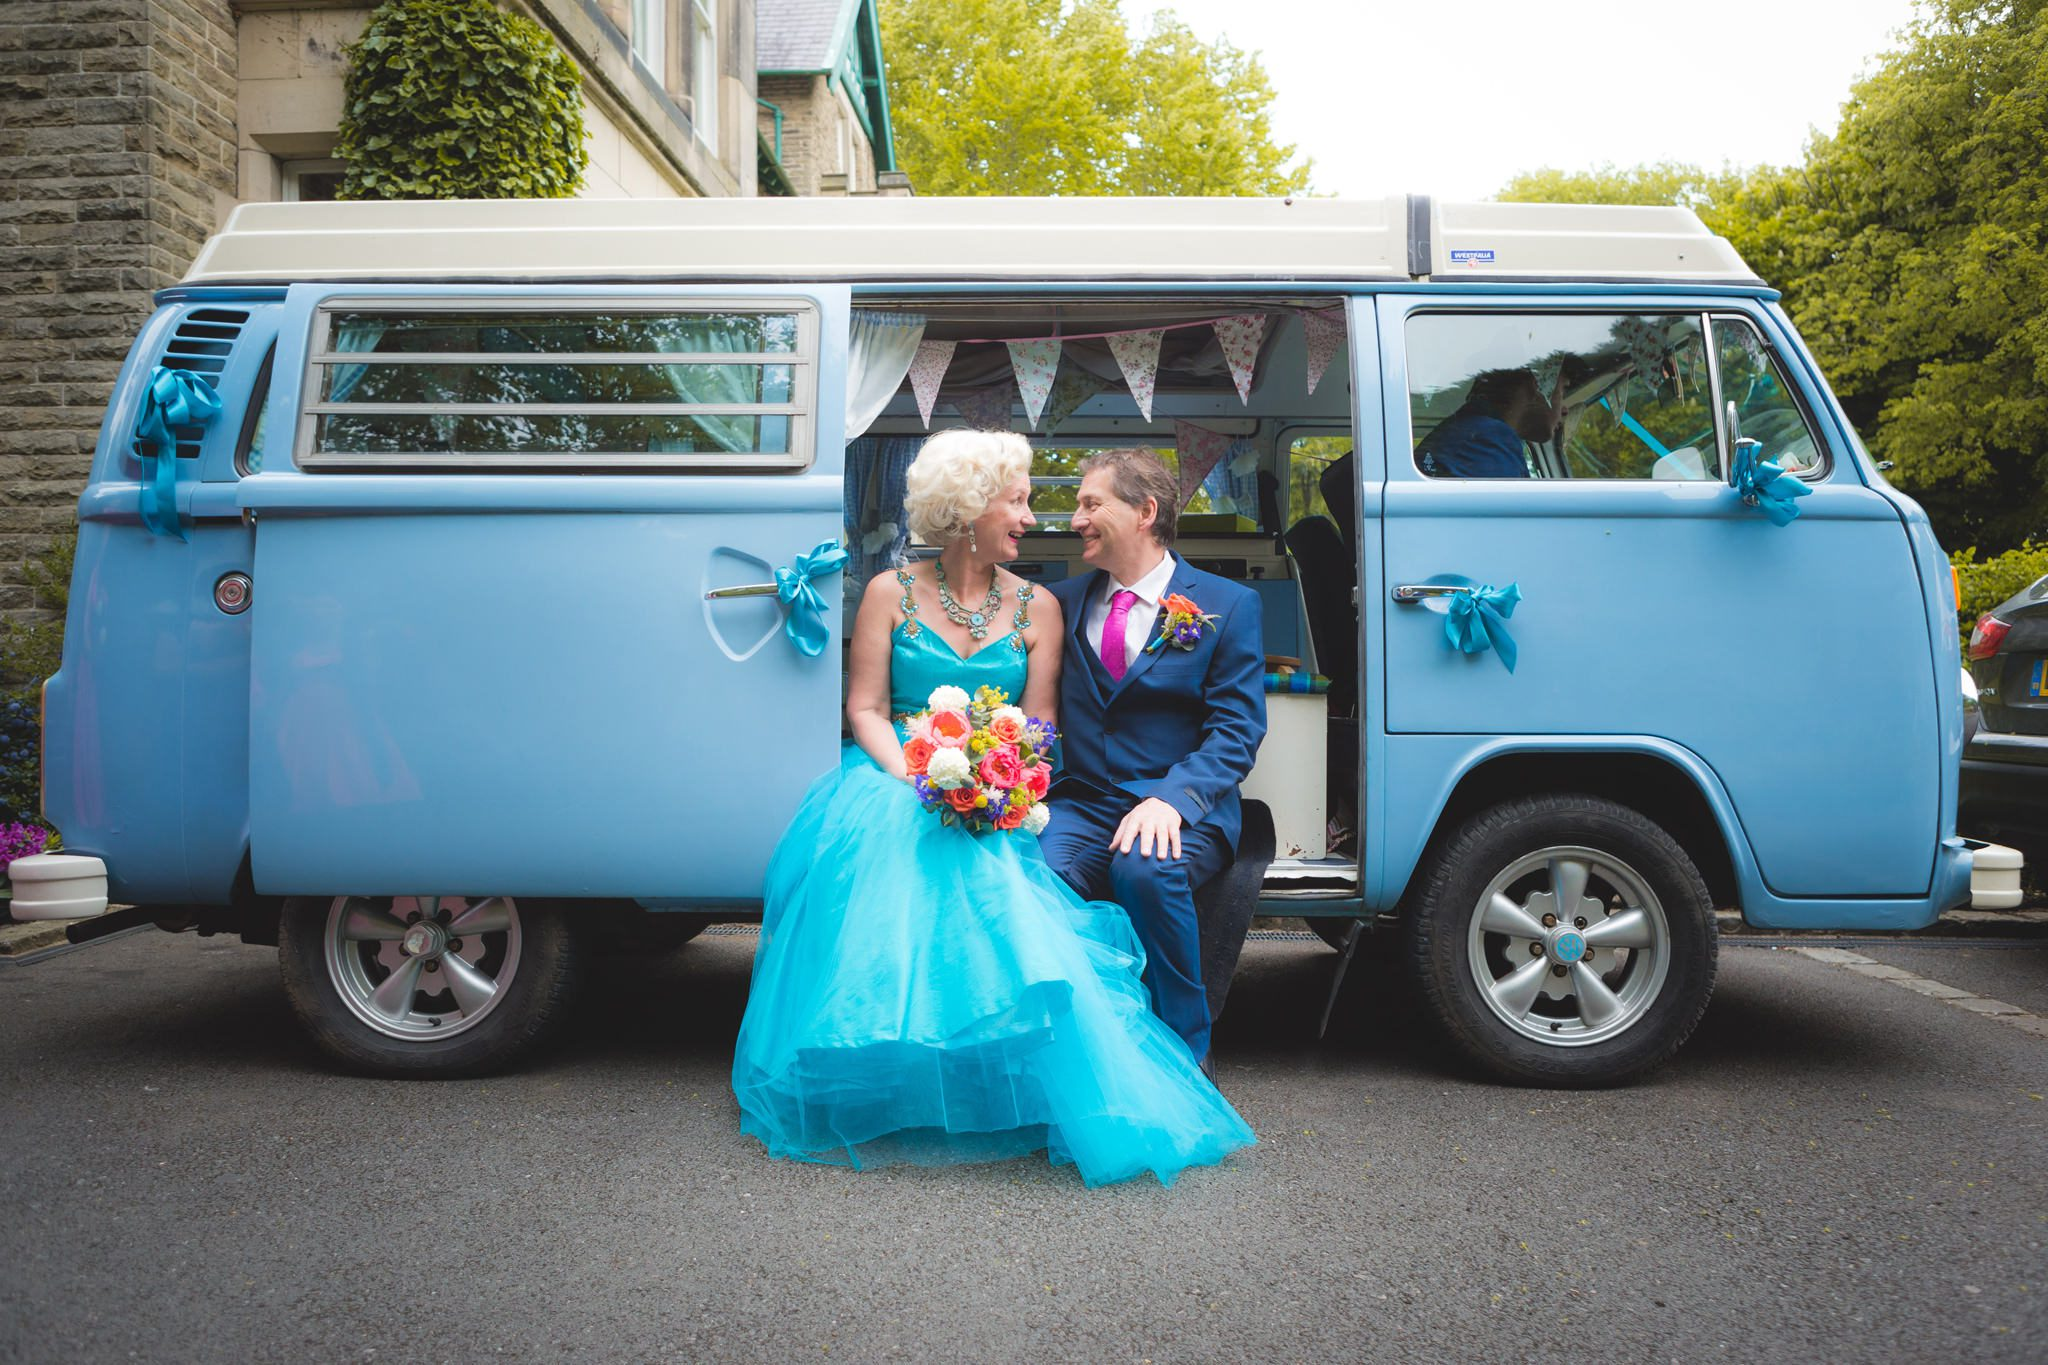 Derbyshire Wedding Photographer - Buxton Pavilion Gardens Campervan